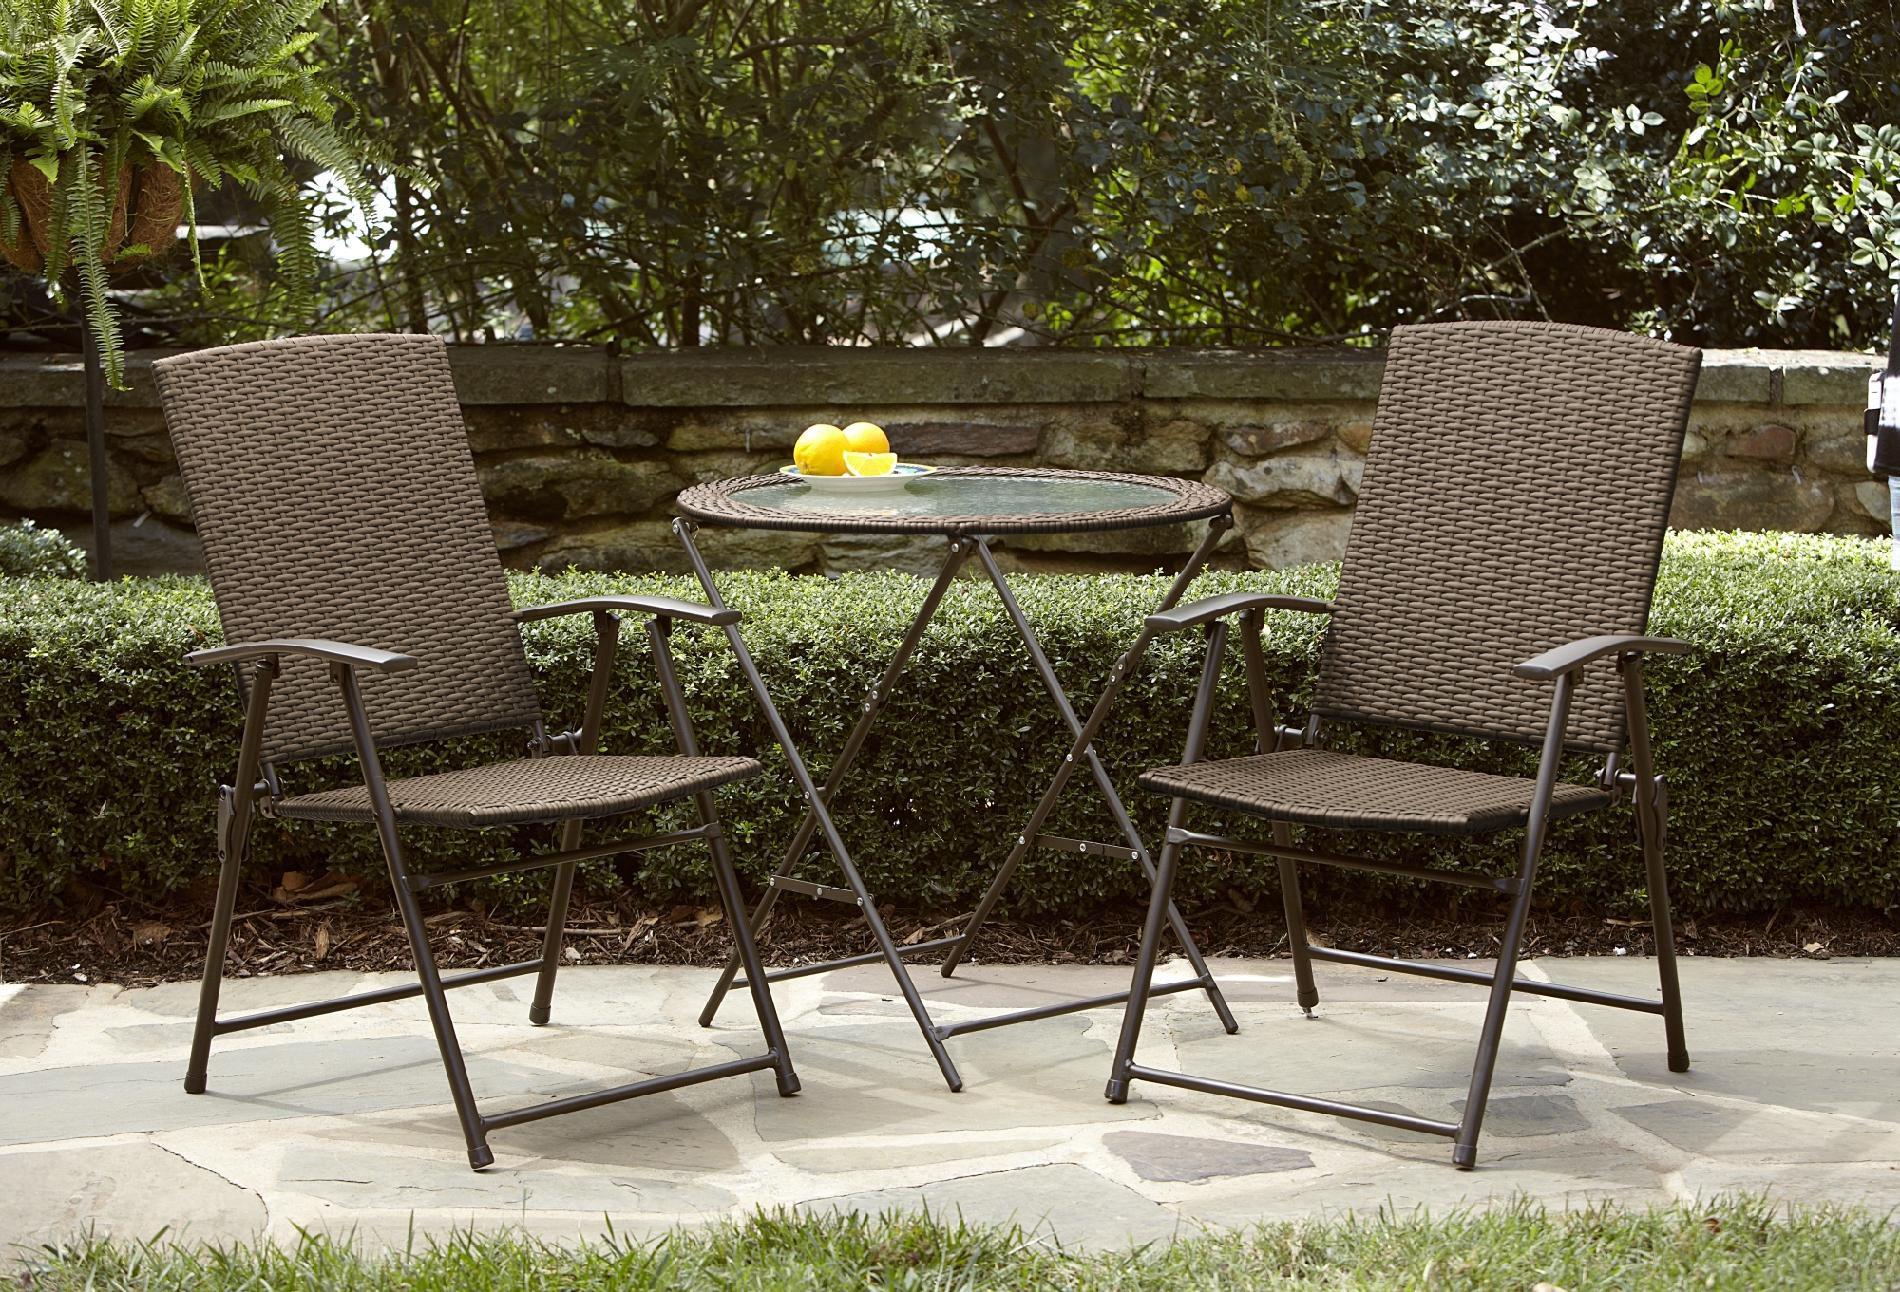 Garden Oasis Wicker Folding Chair  Light Option Limited